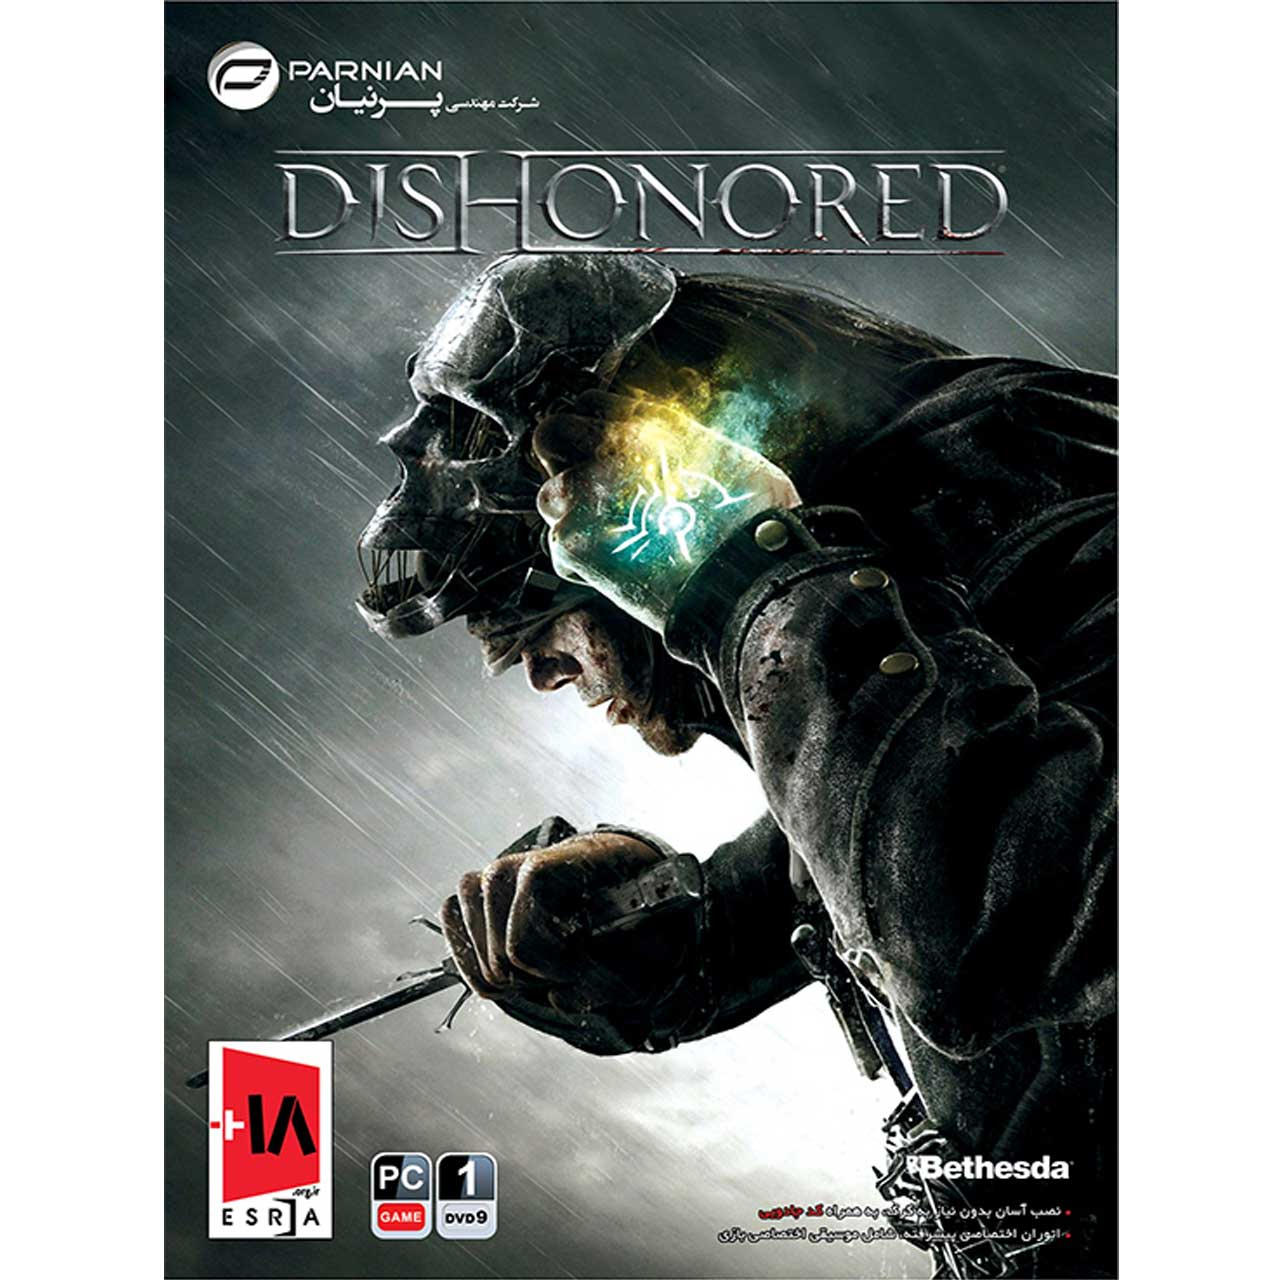 بازی Dishonored مخصوص کامپیوتر